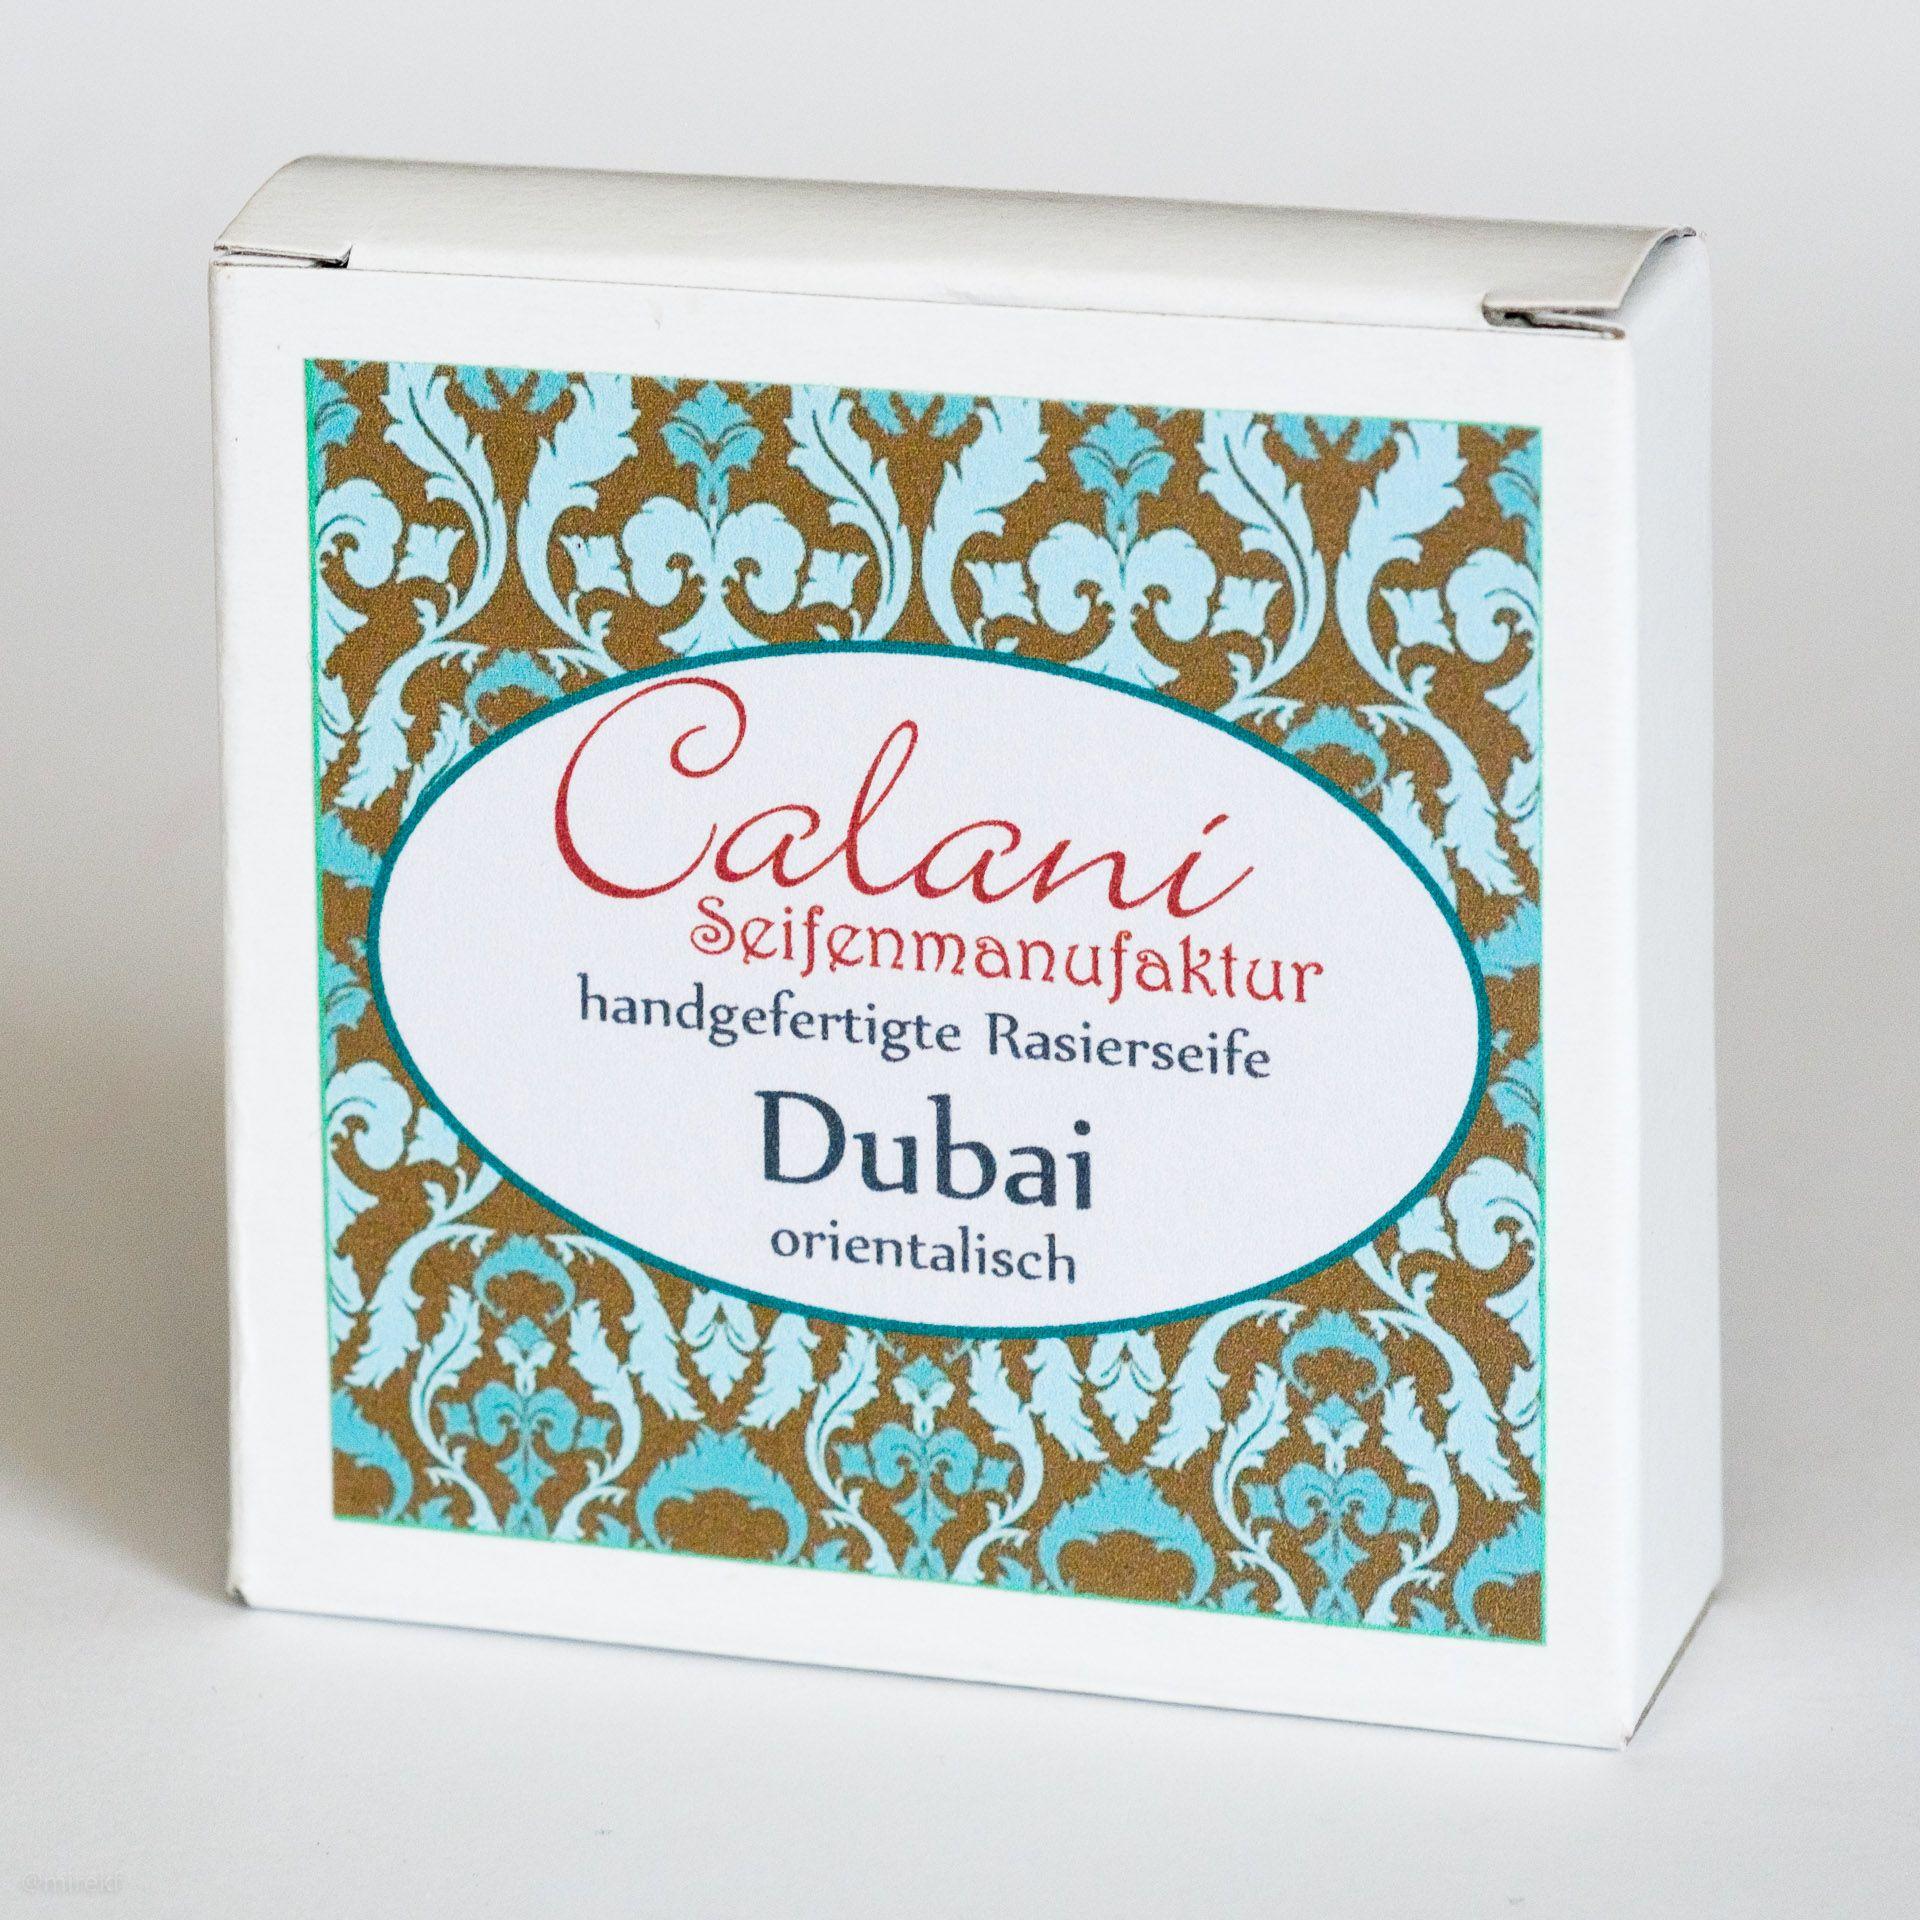 Opakowanie mydła do golenia Calani Dubai Rasierseife